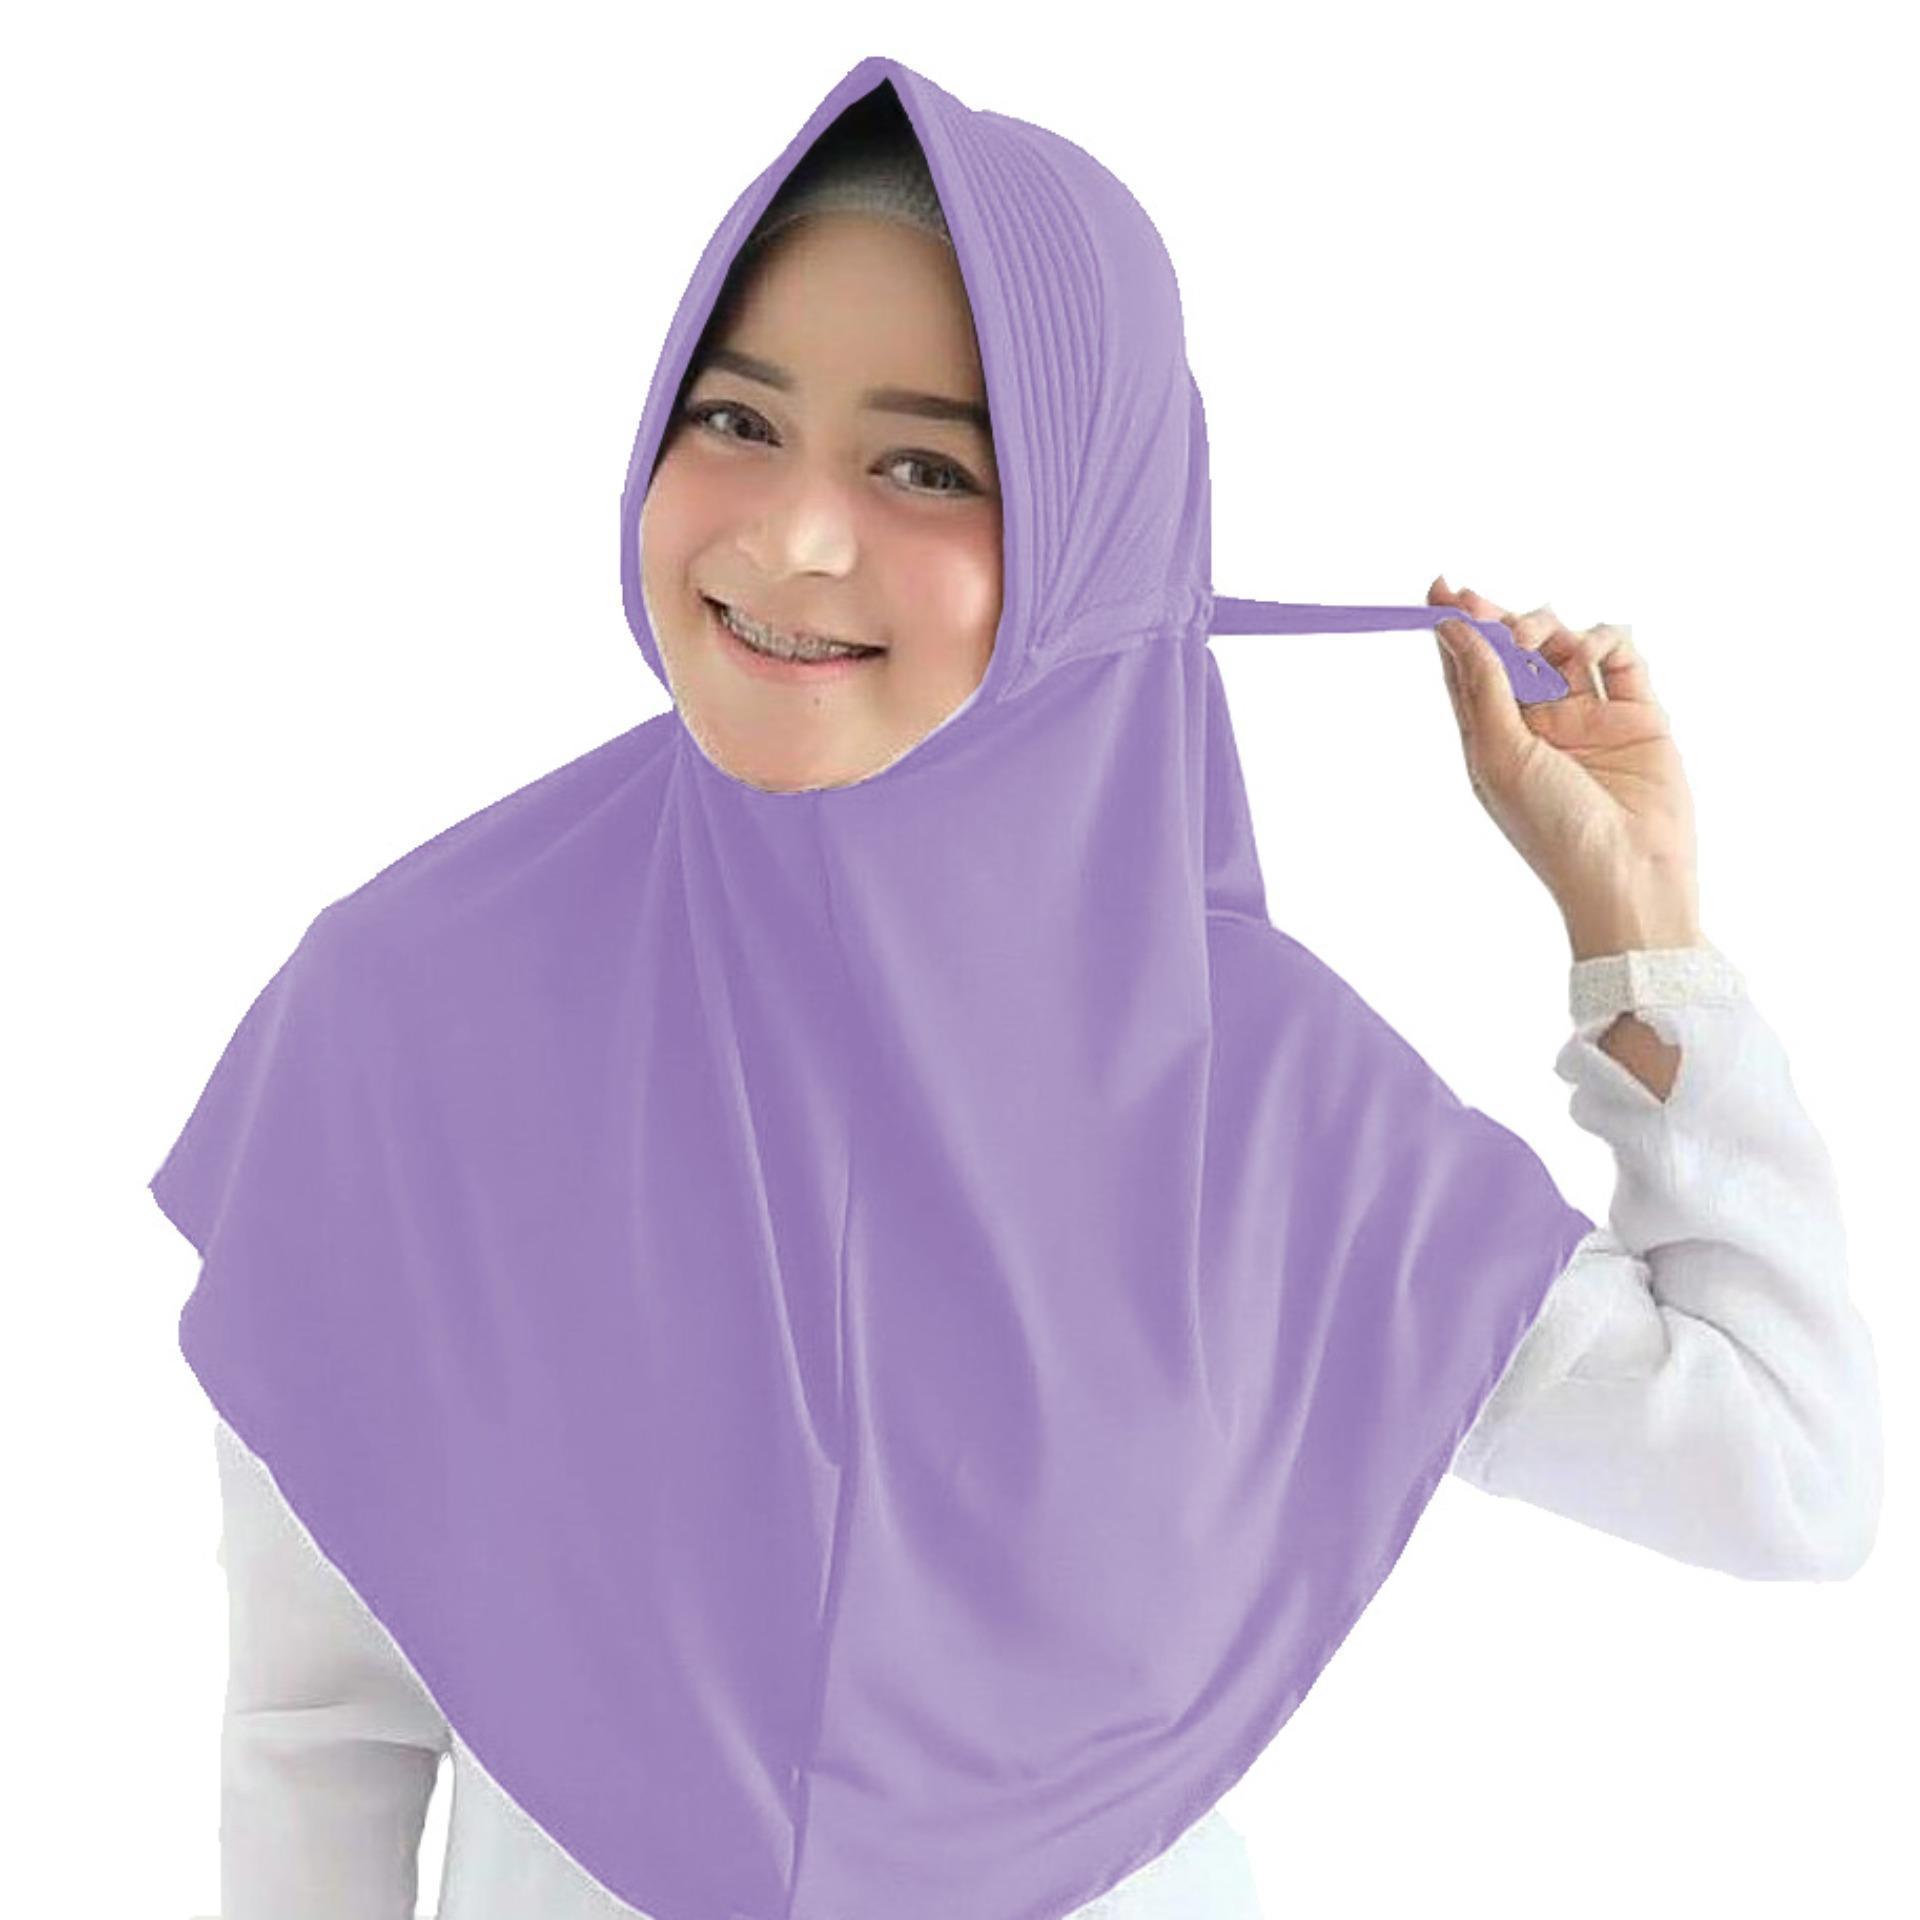 Jual Size M Kaos Polos Combed 20s 30s Harga Rp 49000 Cotton Bee Maulana Hijab Jilbab Instan Serut Jokowi Jersey Kerudung